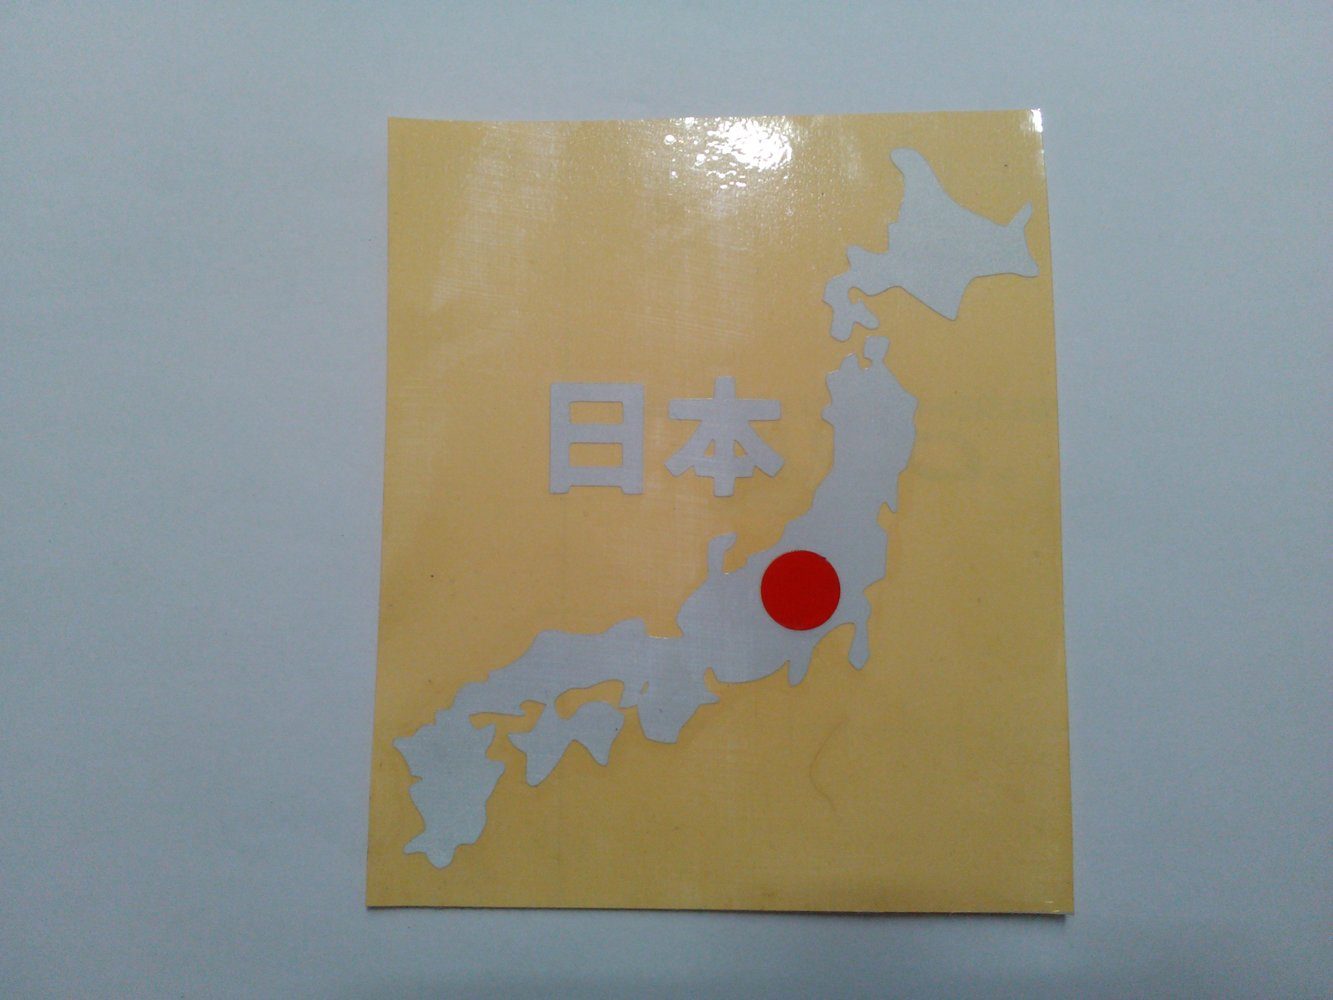 Japan Map Dai Nippon Stickers - REFLECTIVE